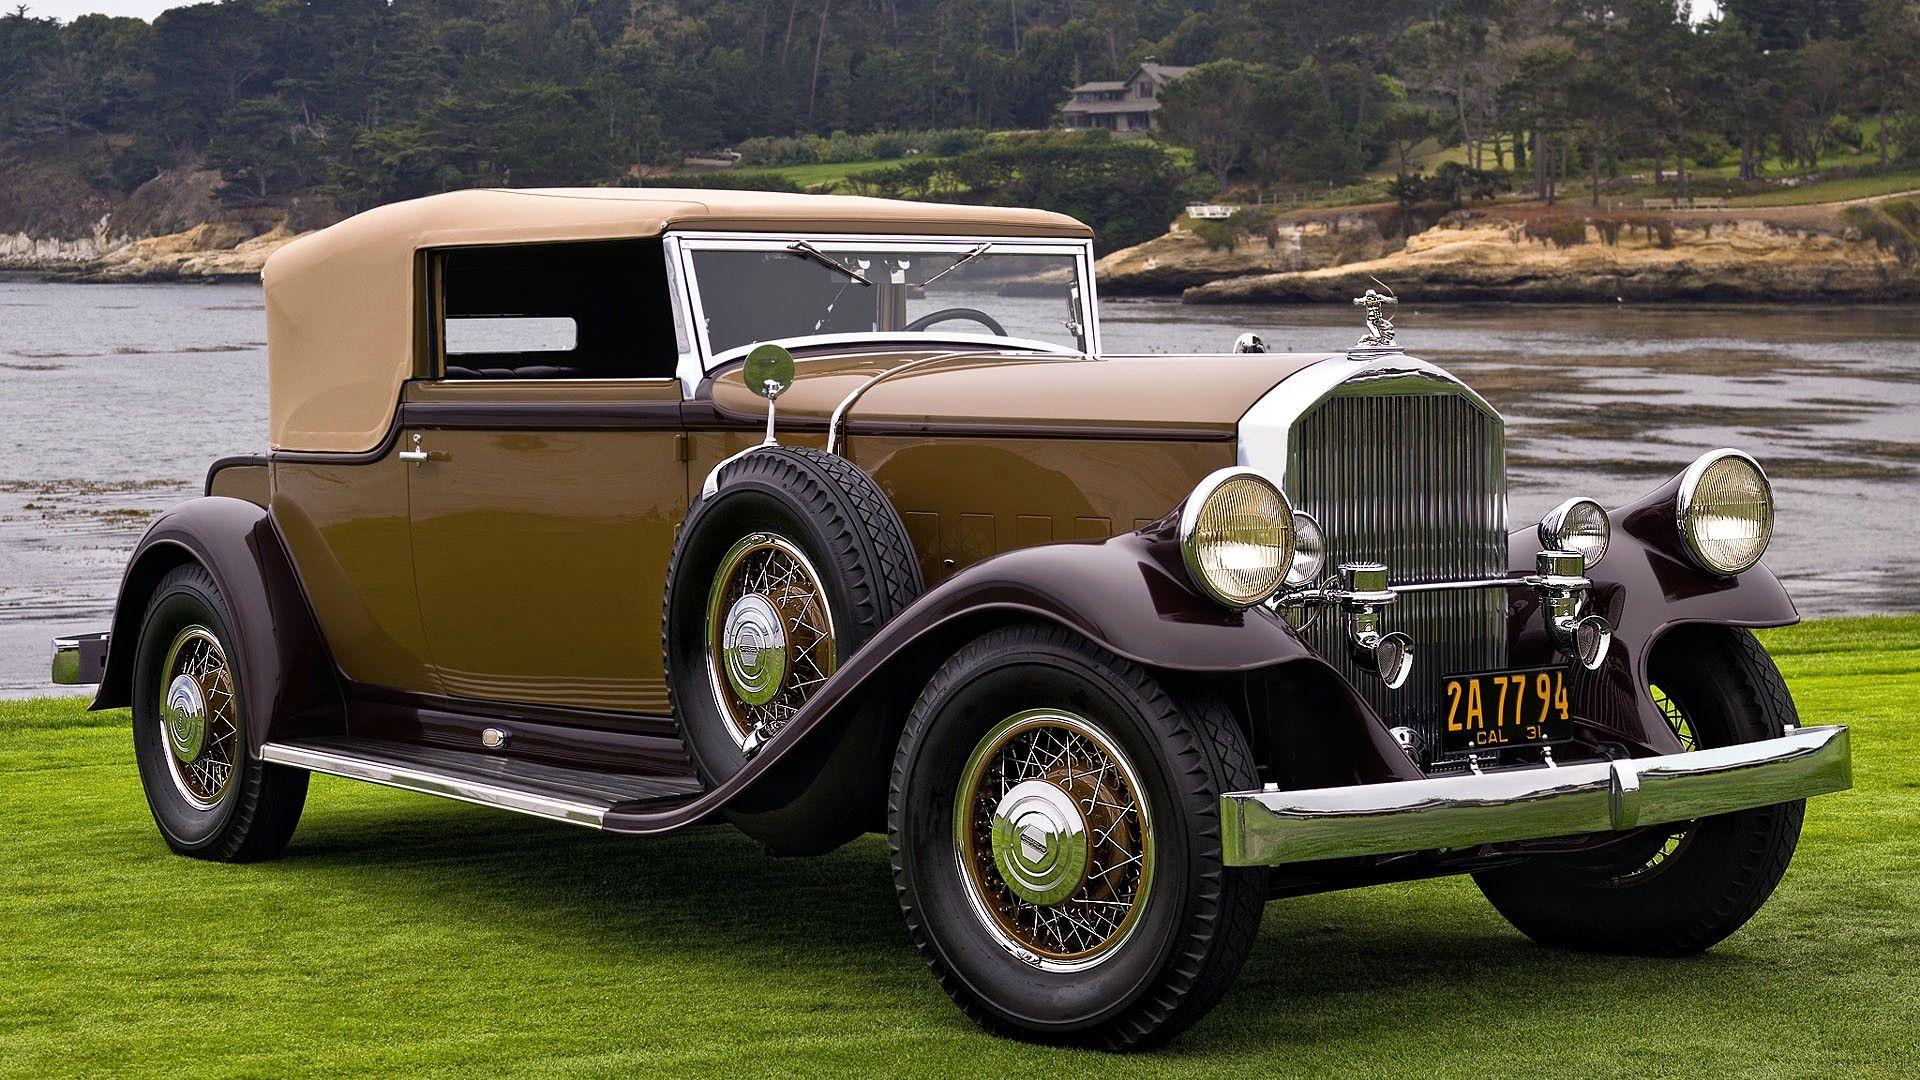 Autos Clásicos, Excelente. | Car images, Vintage and Cars